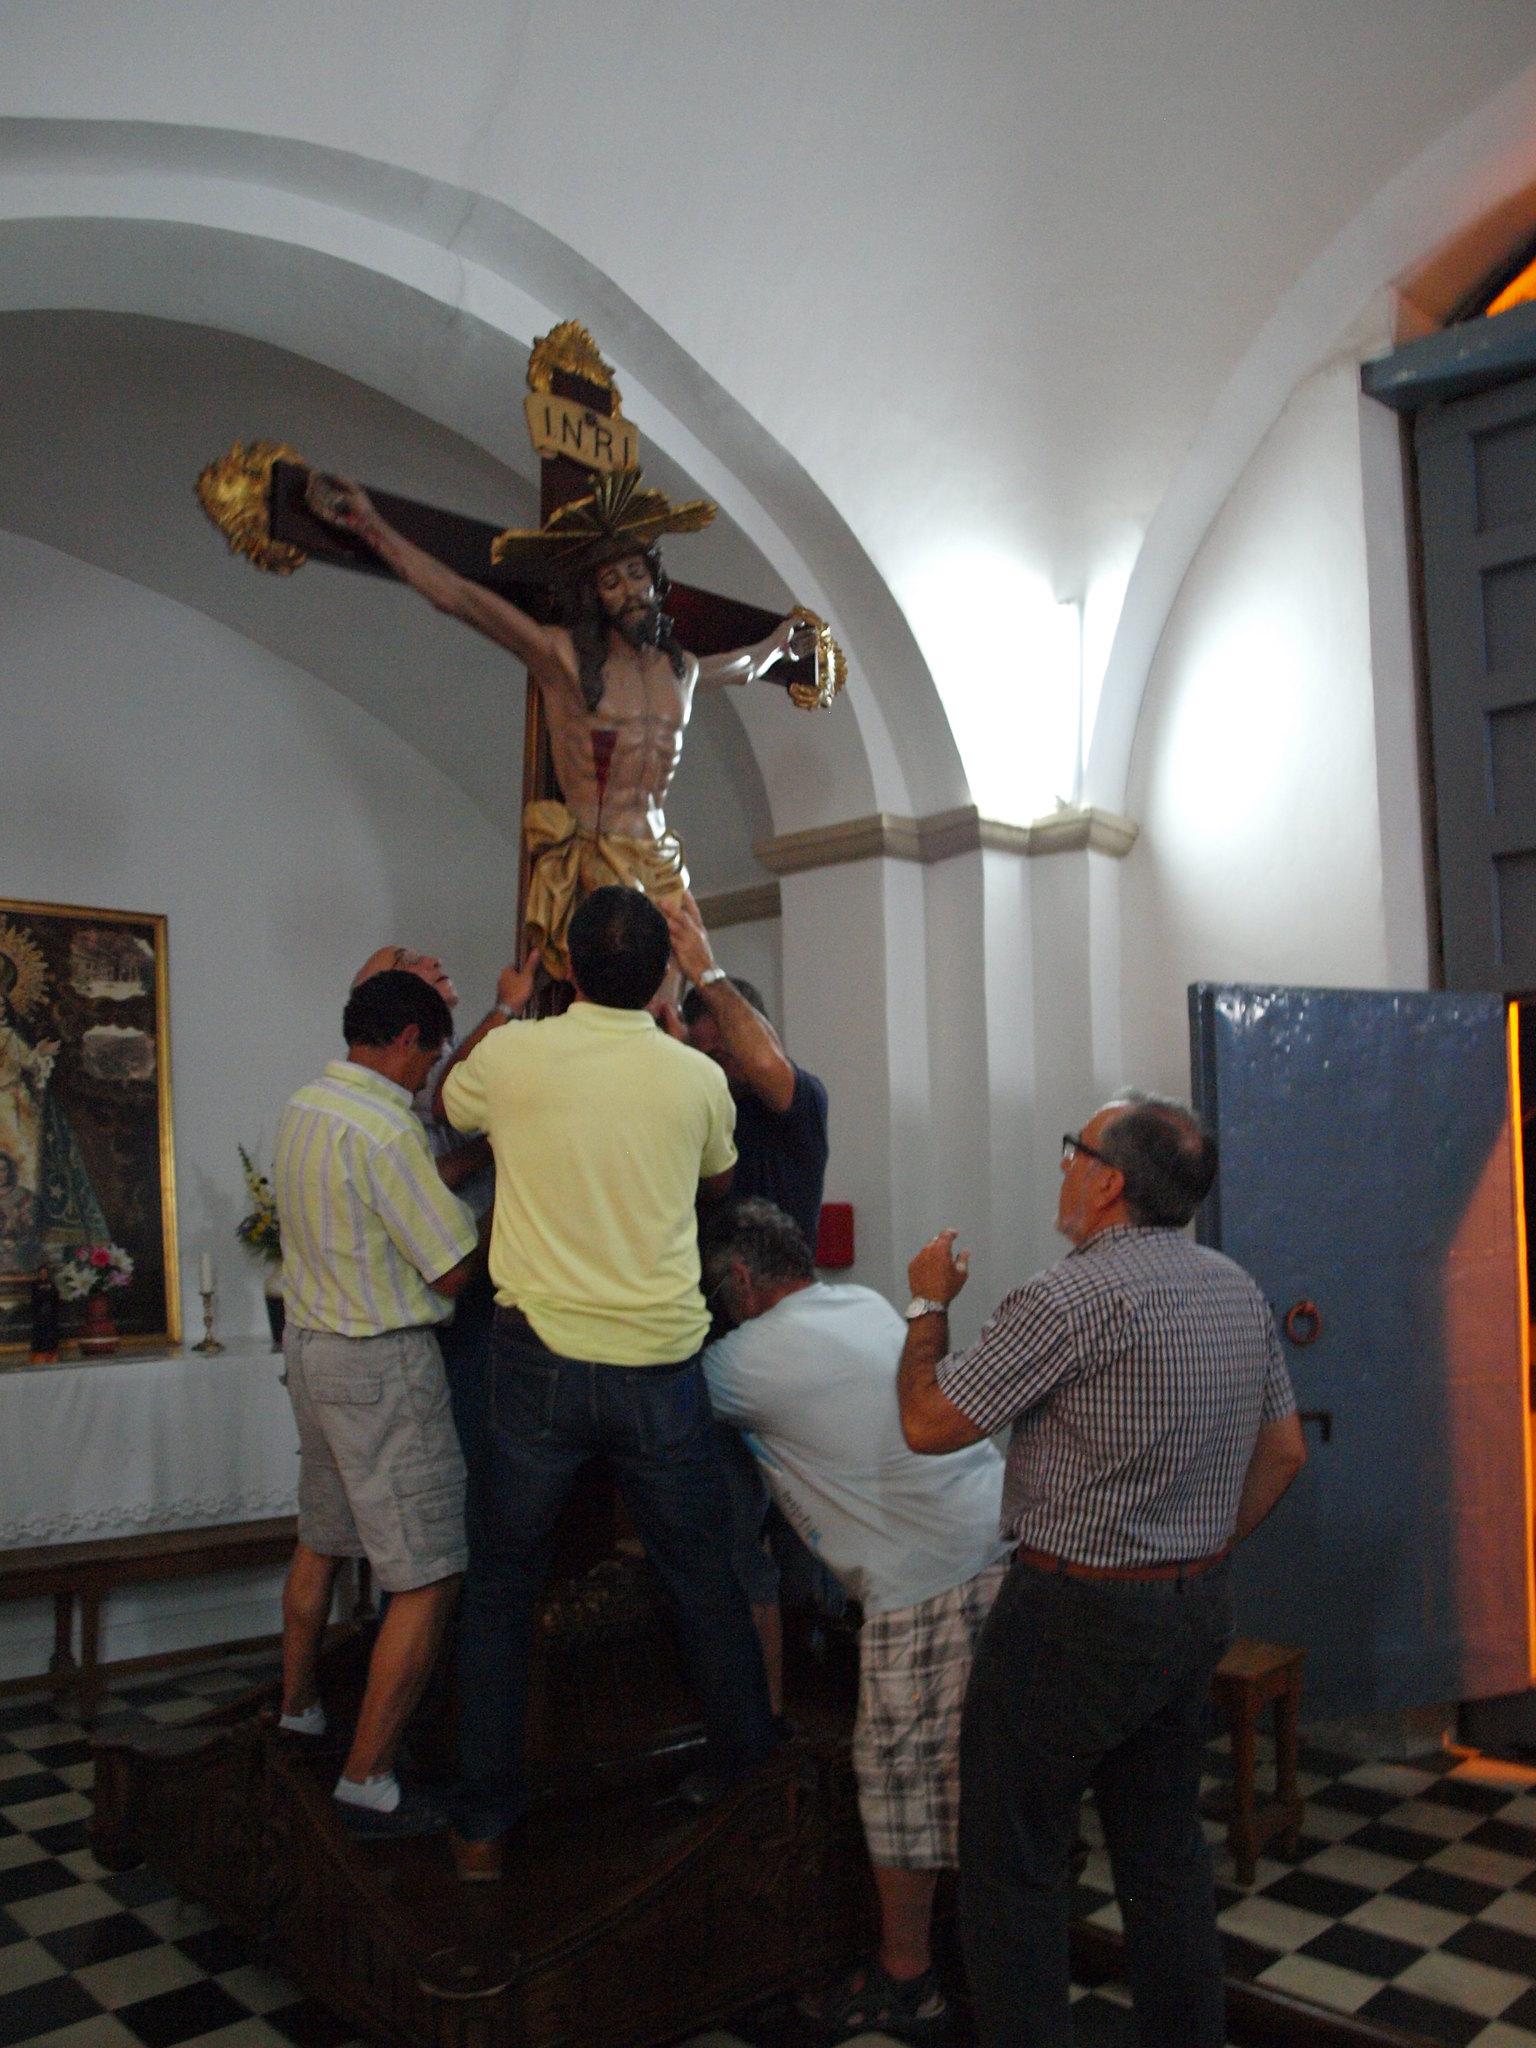 (2014-07-07) - Recogida de Imagen - Paloma Romero Torralba (37)